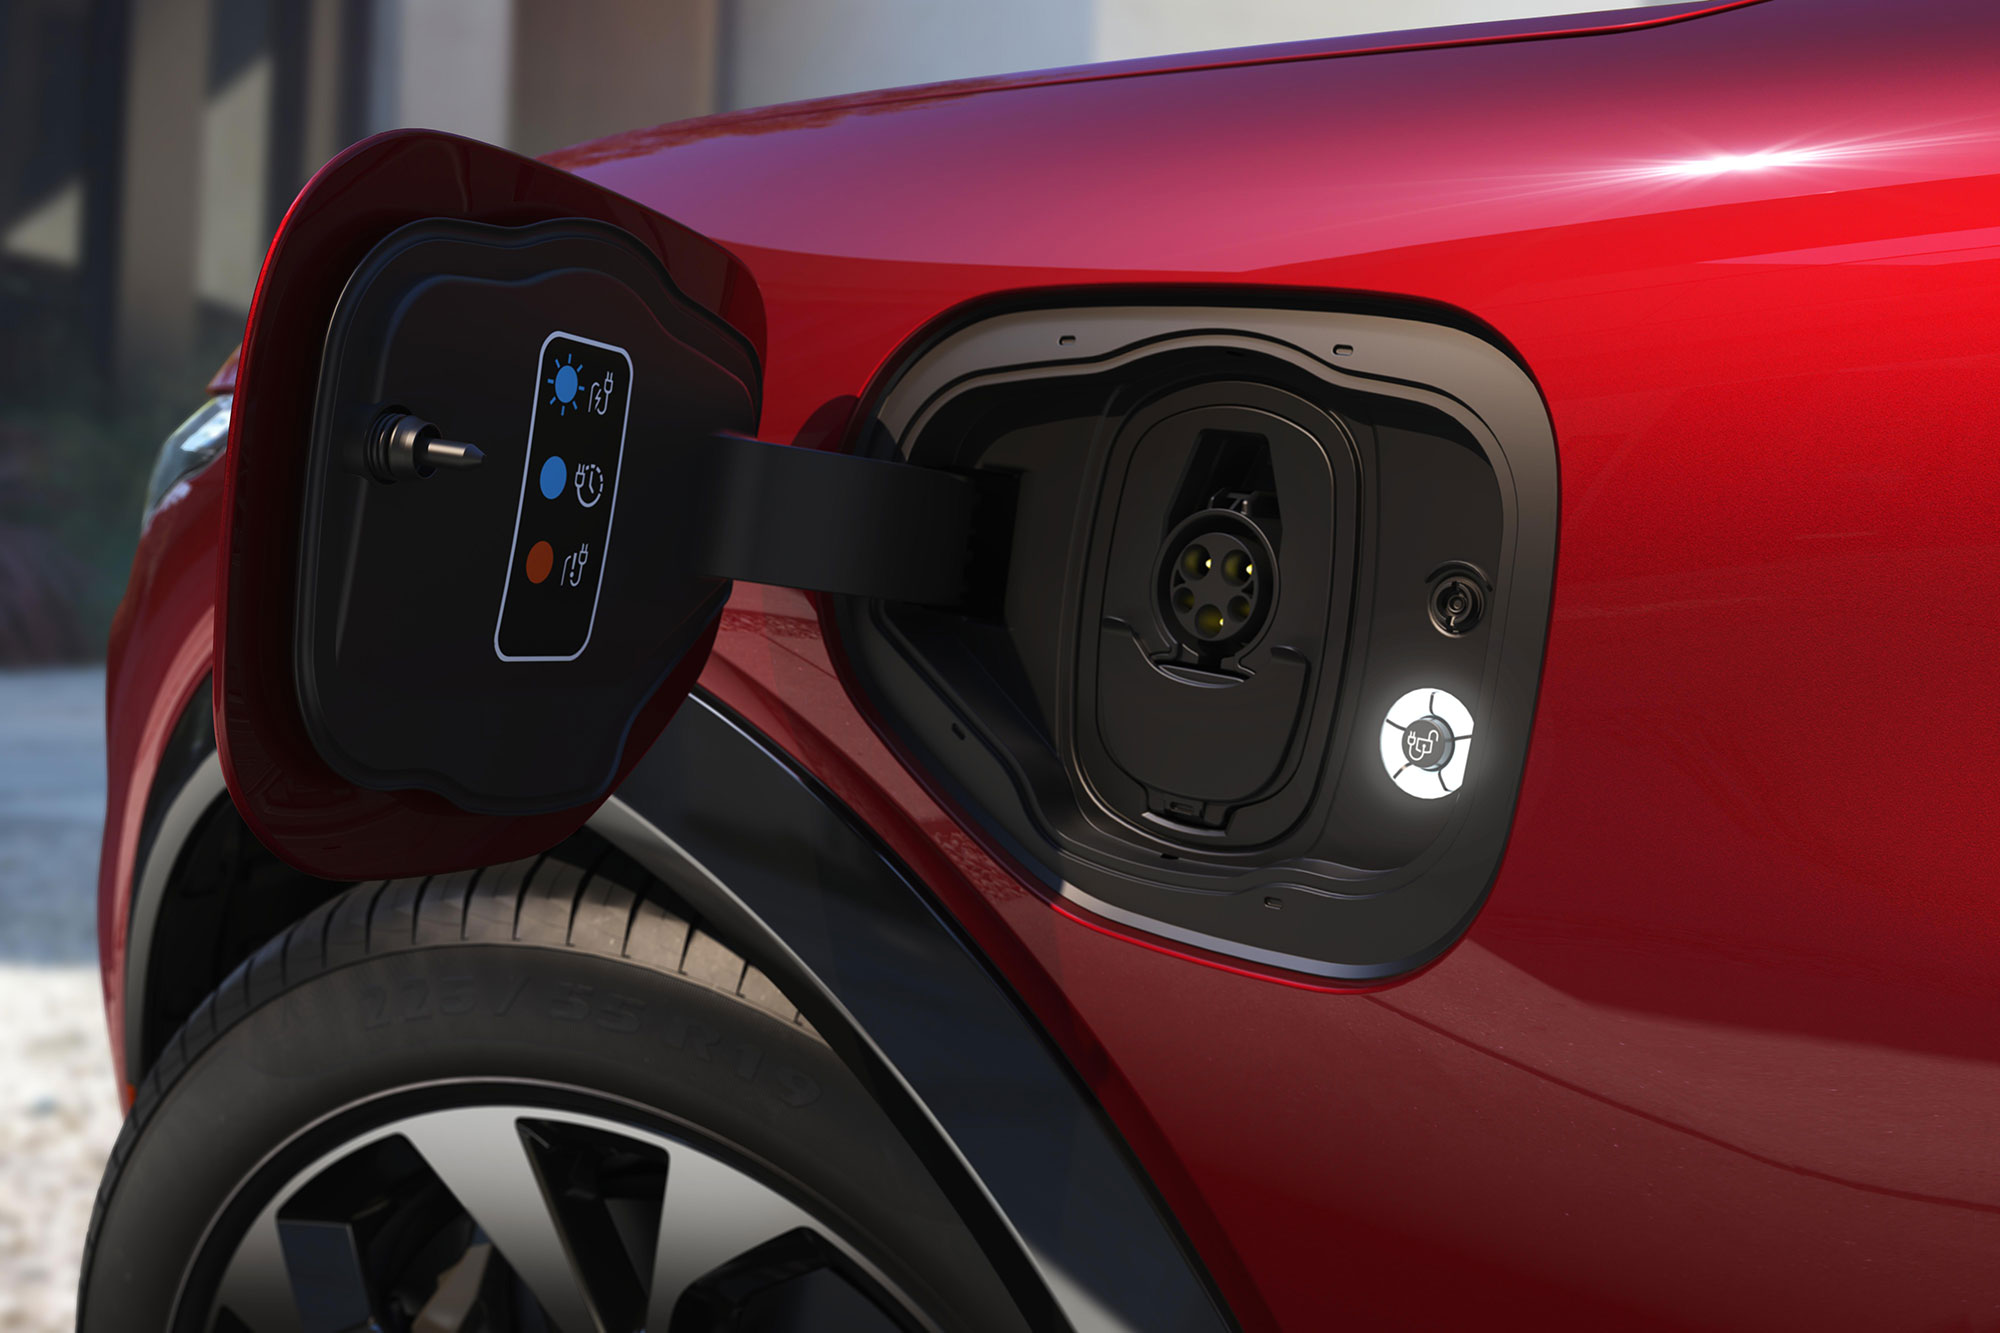 2021 Mustang Mach-e charging port